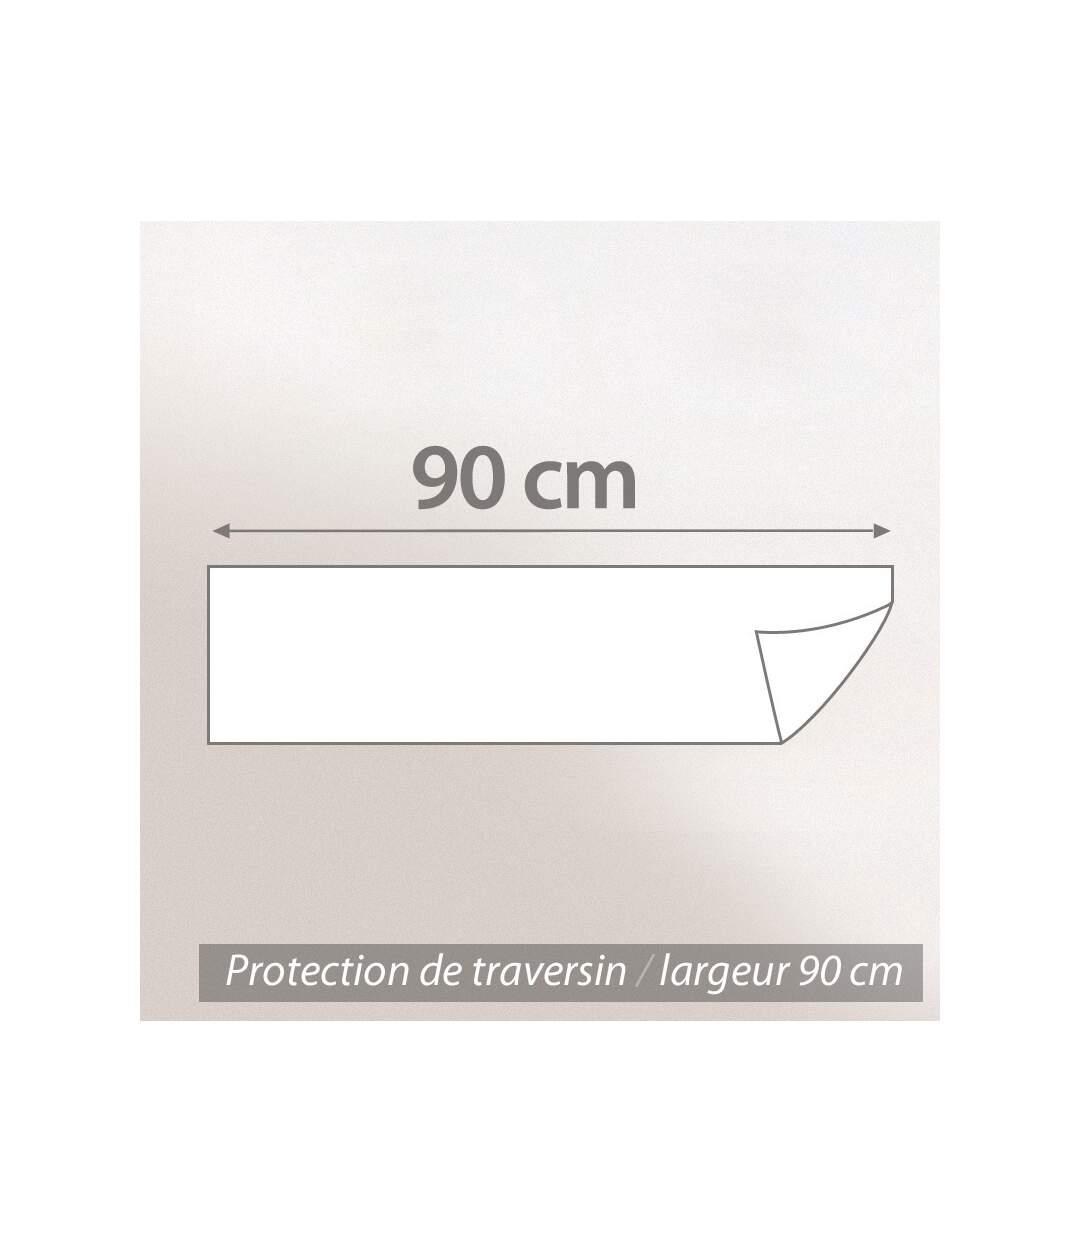 Housse de Protection de traversin absorbante Antonin Blanc 90 cm